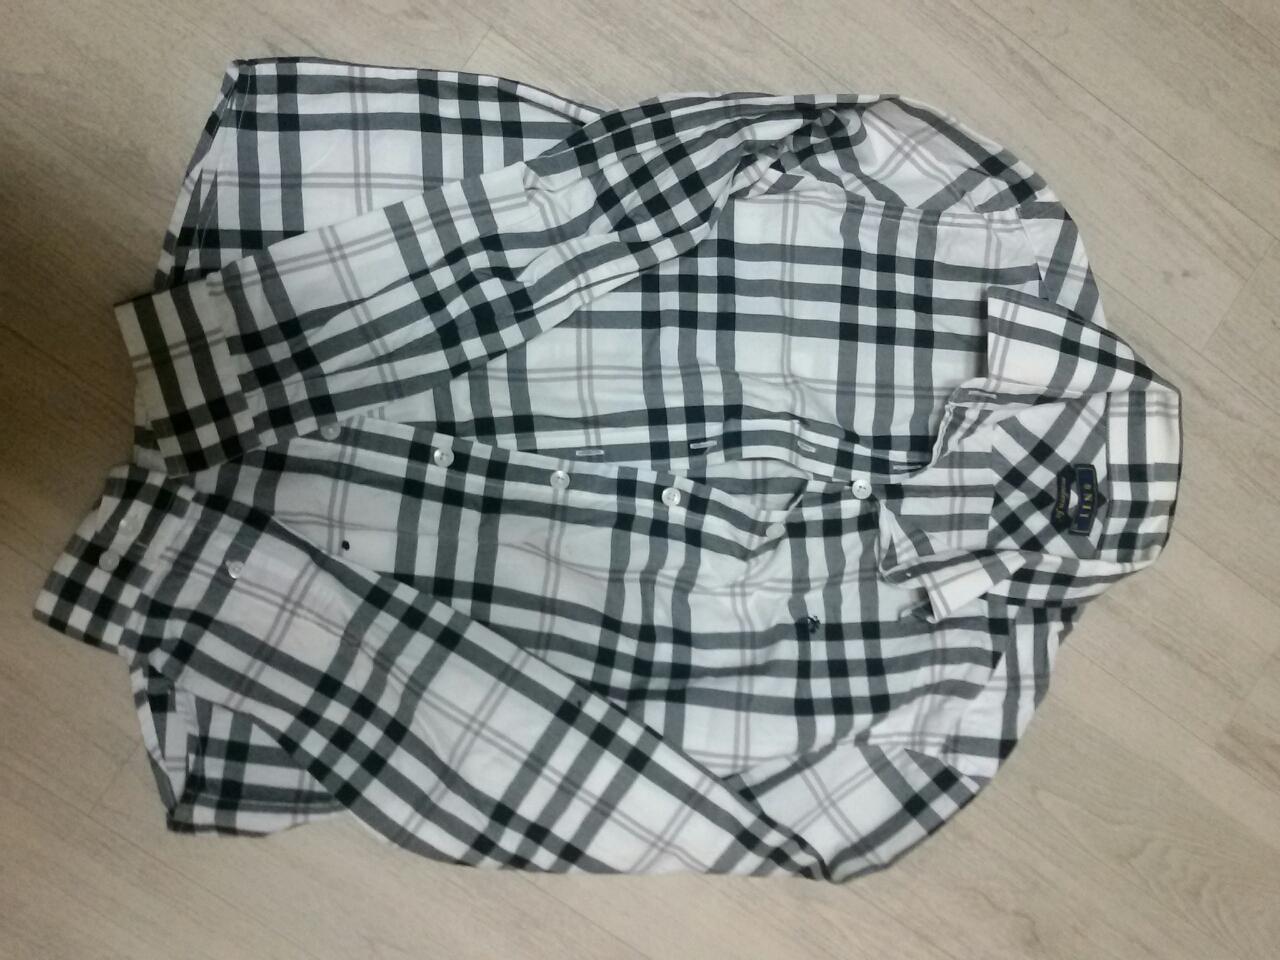 NII 셔츠